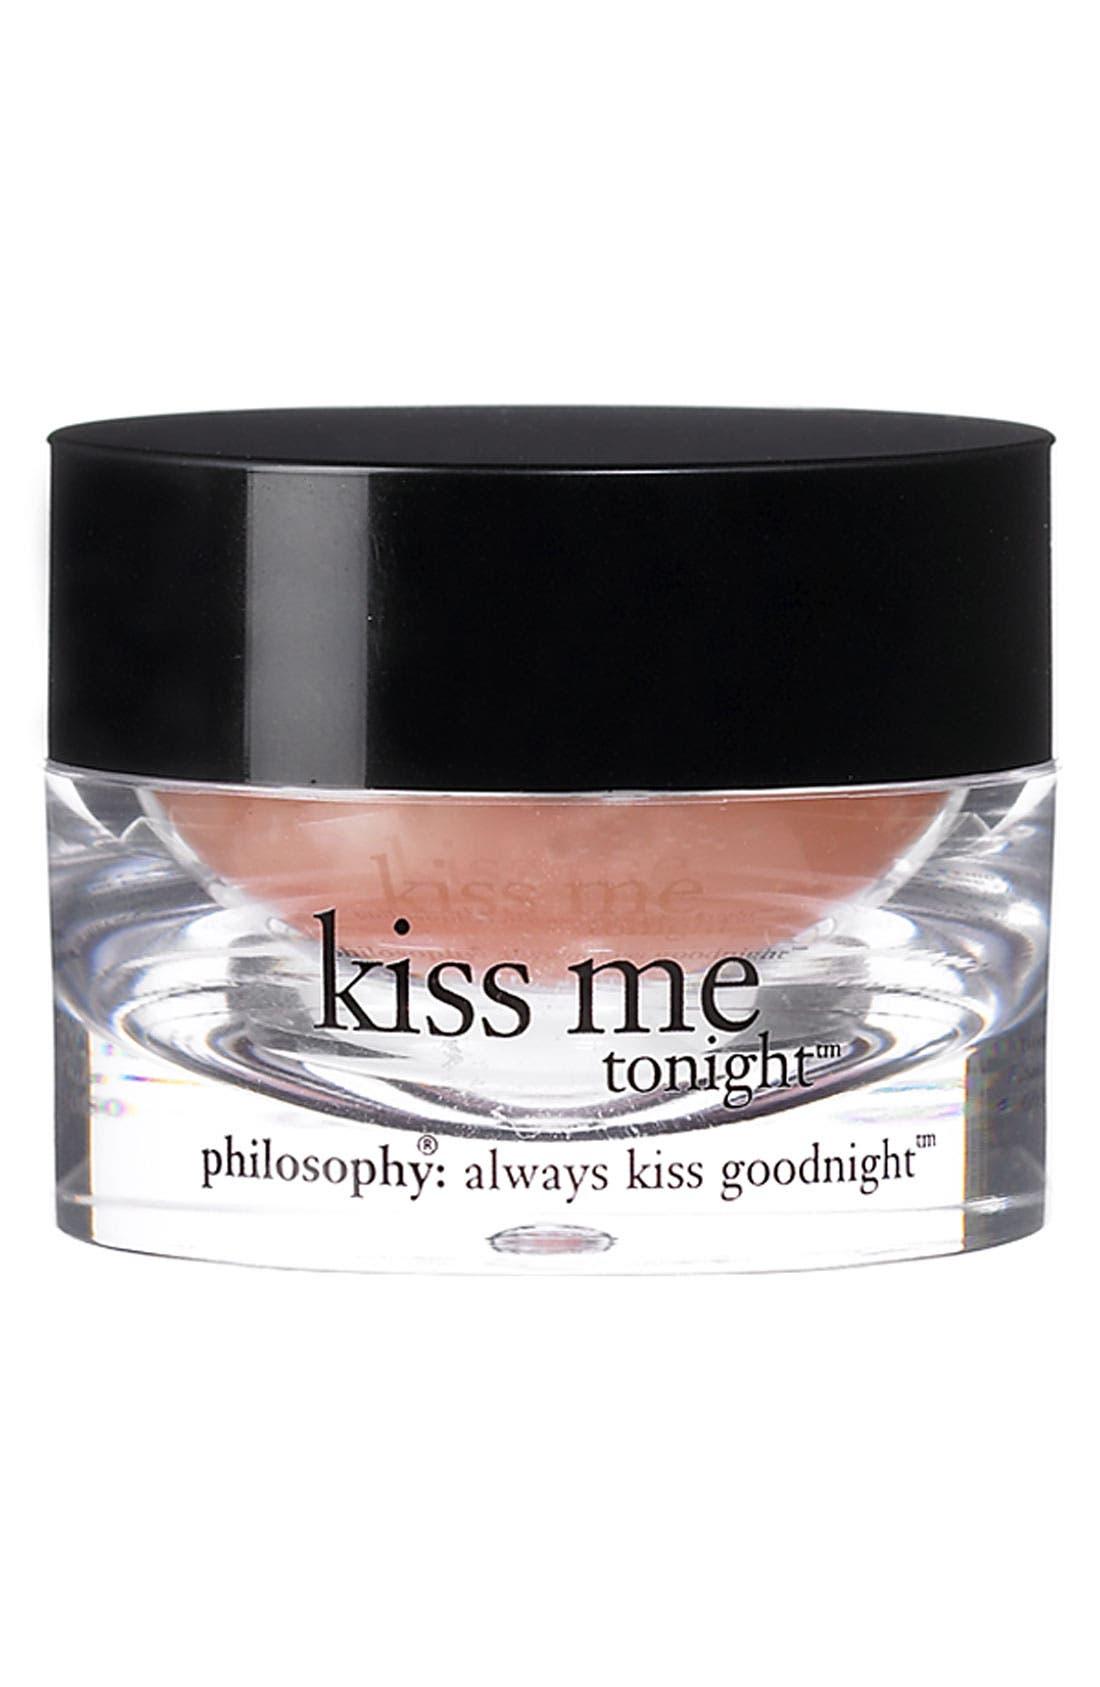 'kiss me tonight' intense lip therapy,                             Main thumbnail 1, color,                             000